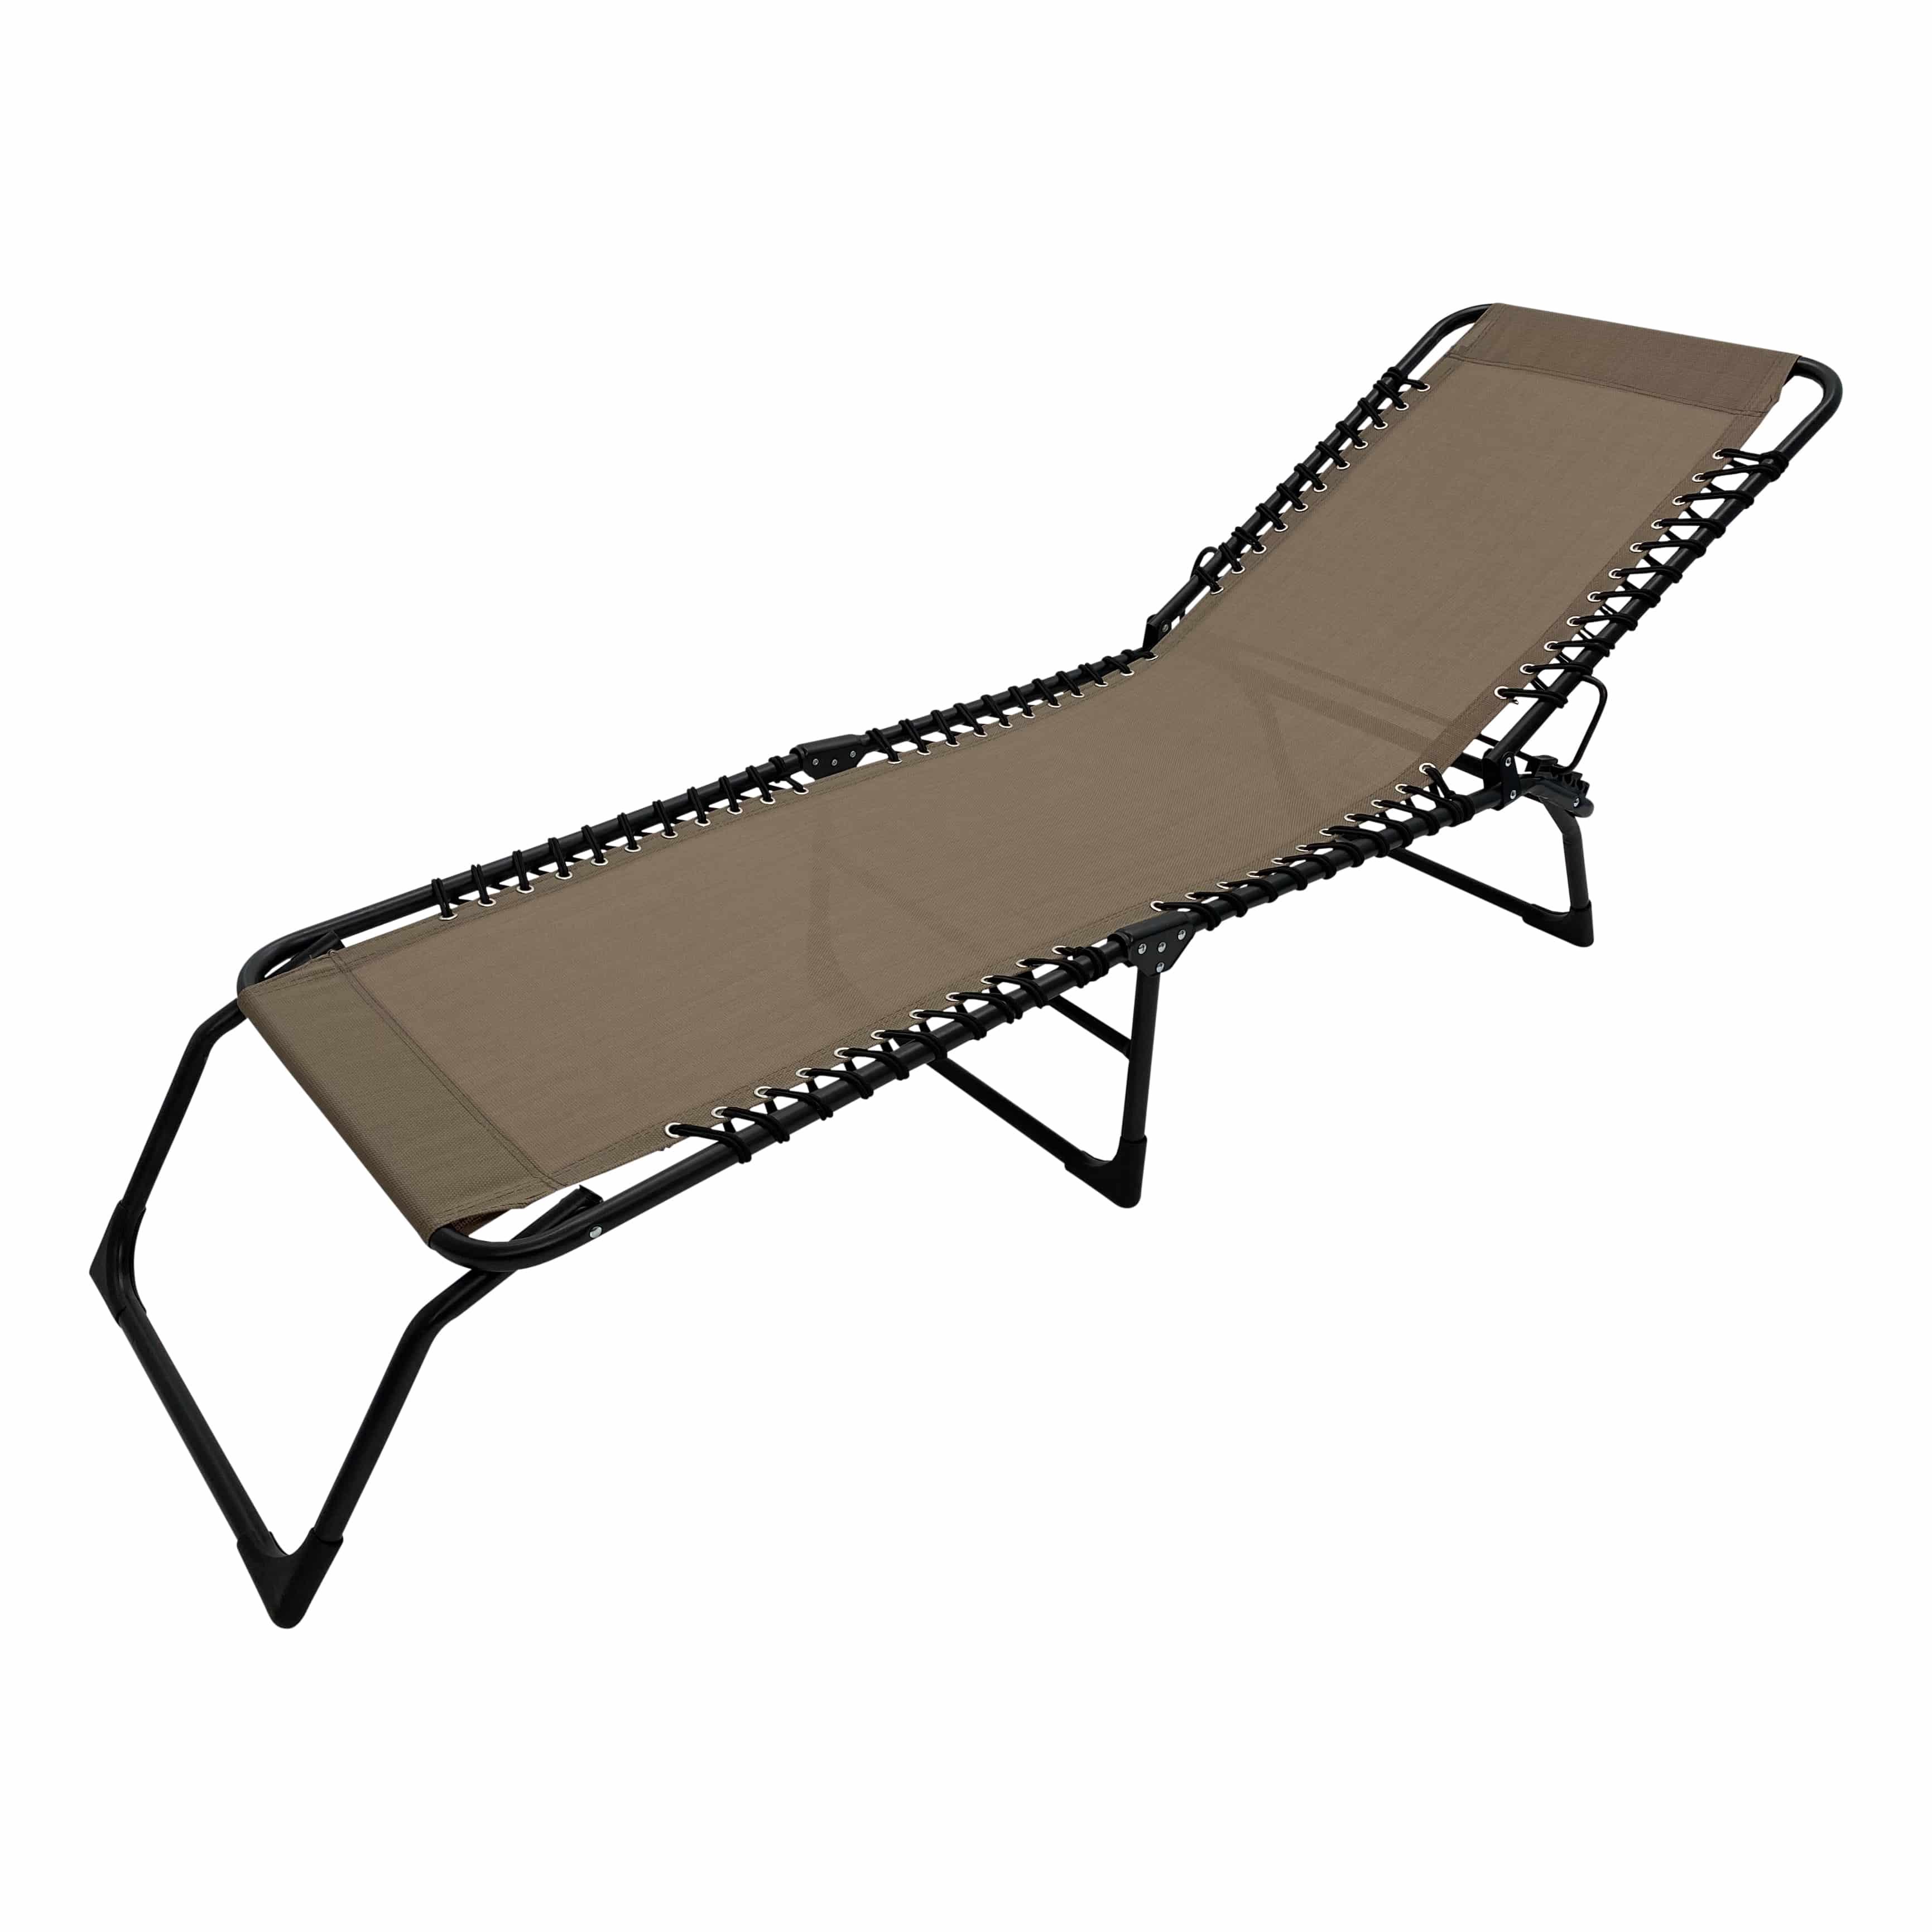 4gardenz® Comfortabel Ventilerend Opvouw Ligbed 190x57x28 cm - Taupe